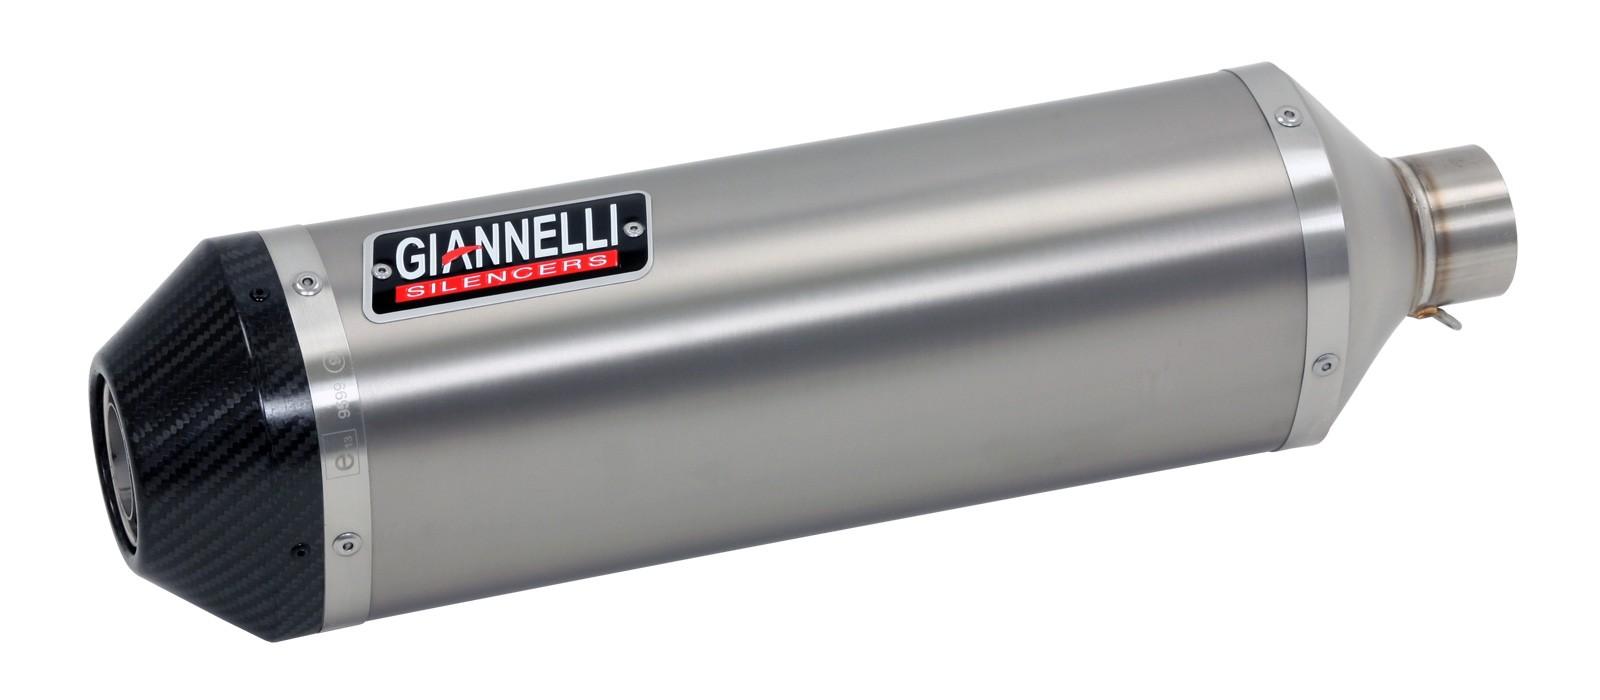 ESCAPES GIANNELLI YAMAHA - Sistema completo IPERSPORT Silenciador carbono con terminación carbono Yamaha MT-07 Giannelli